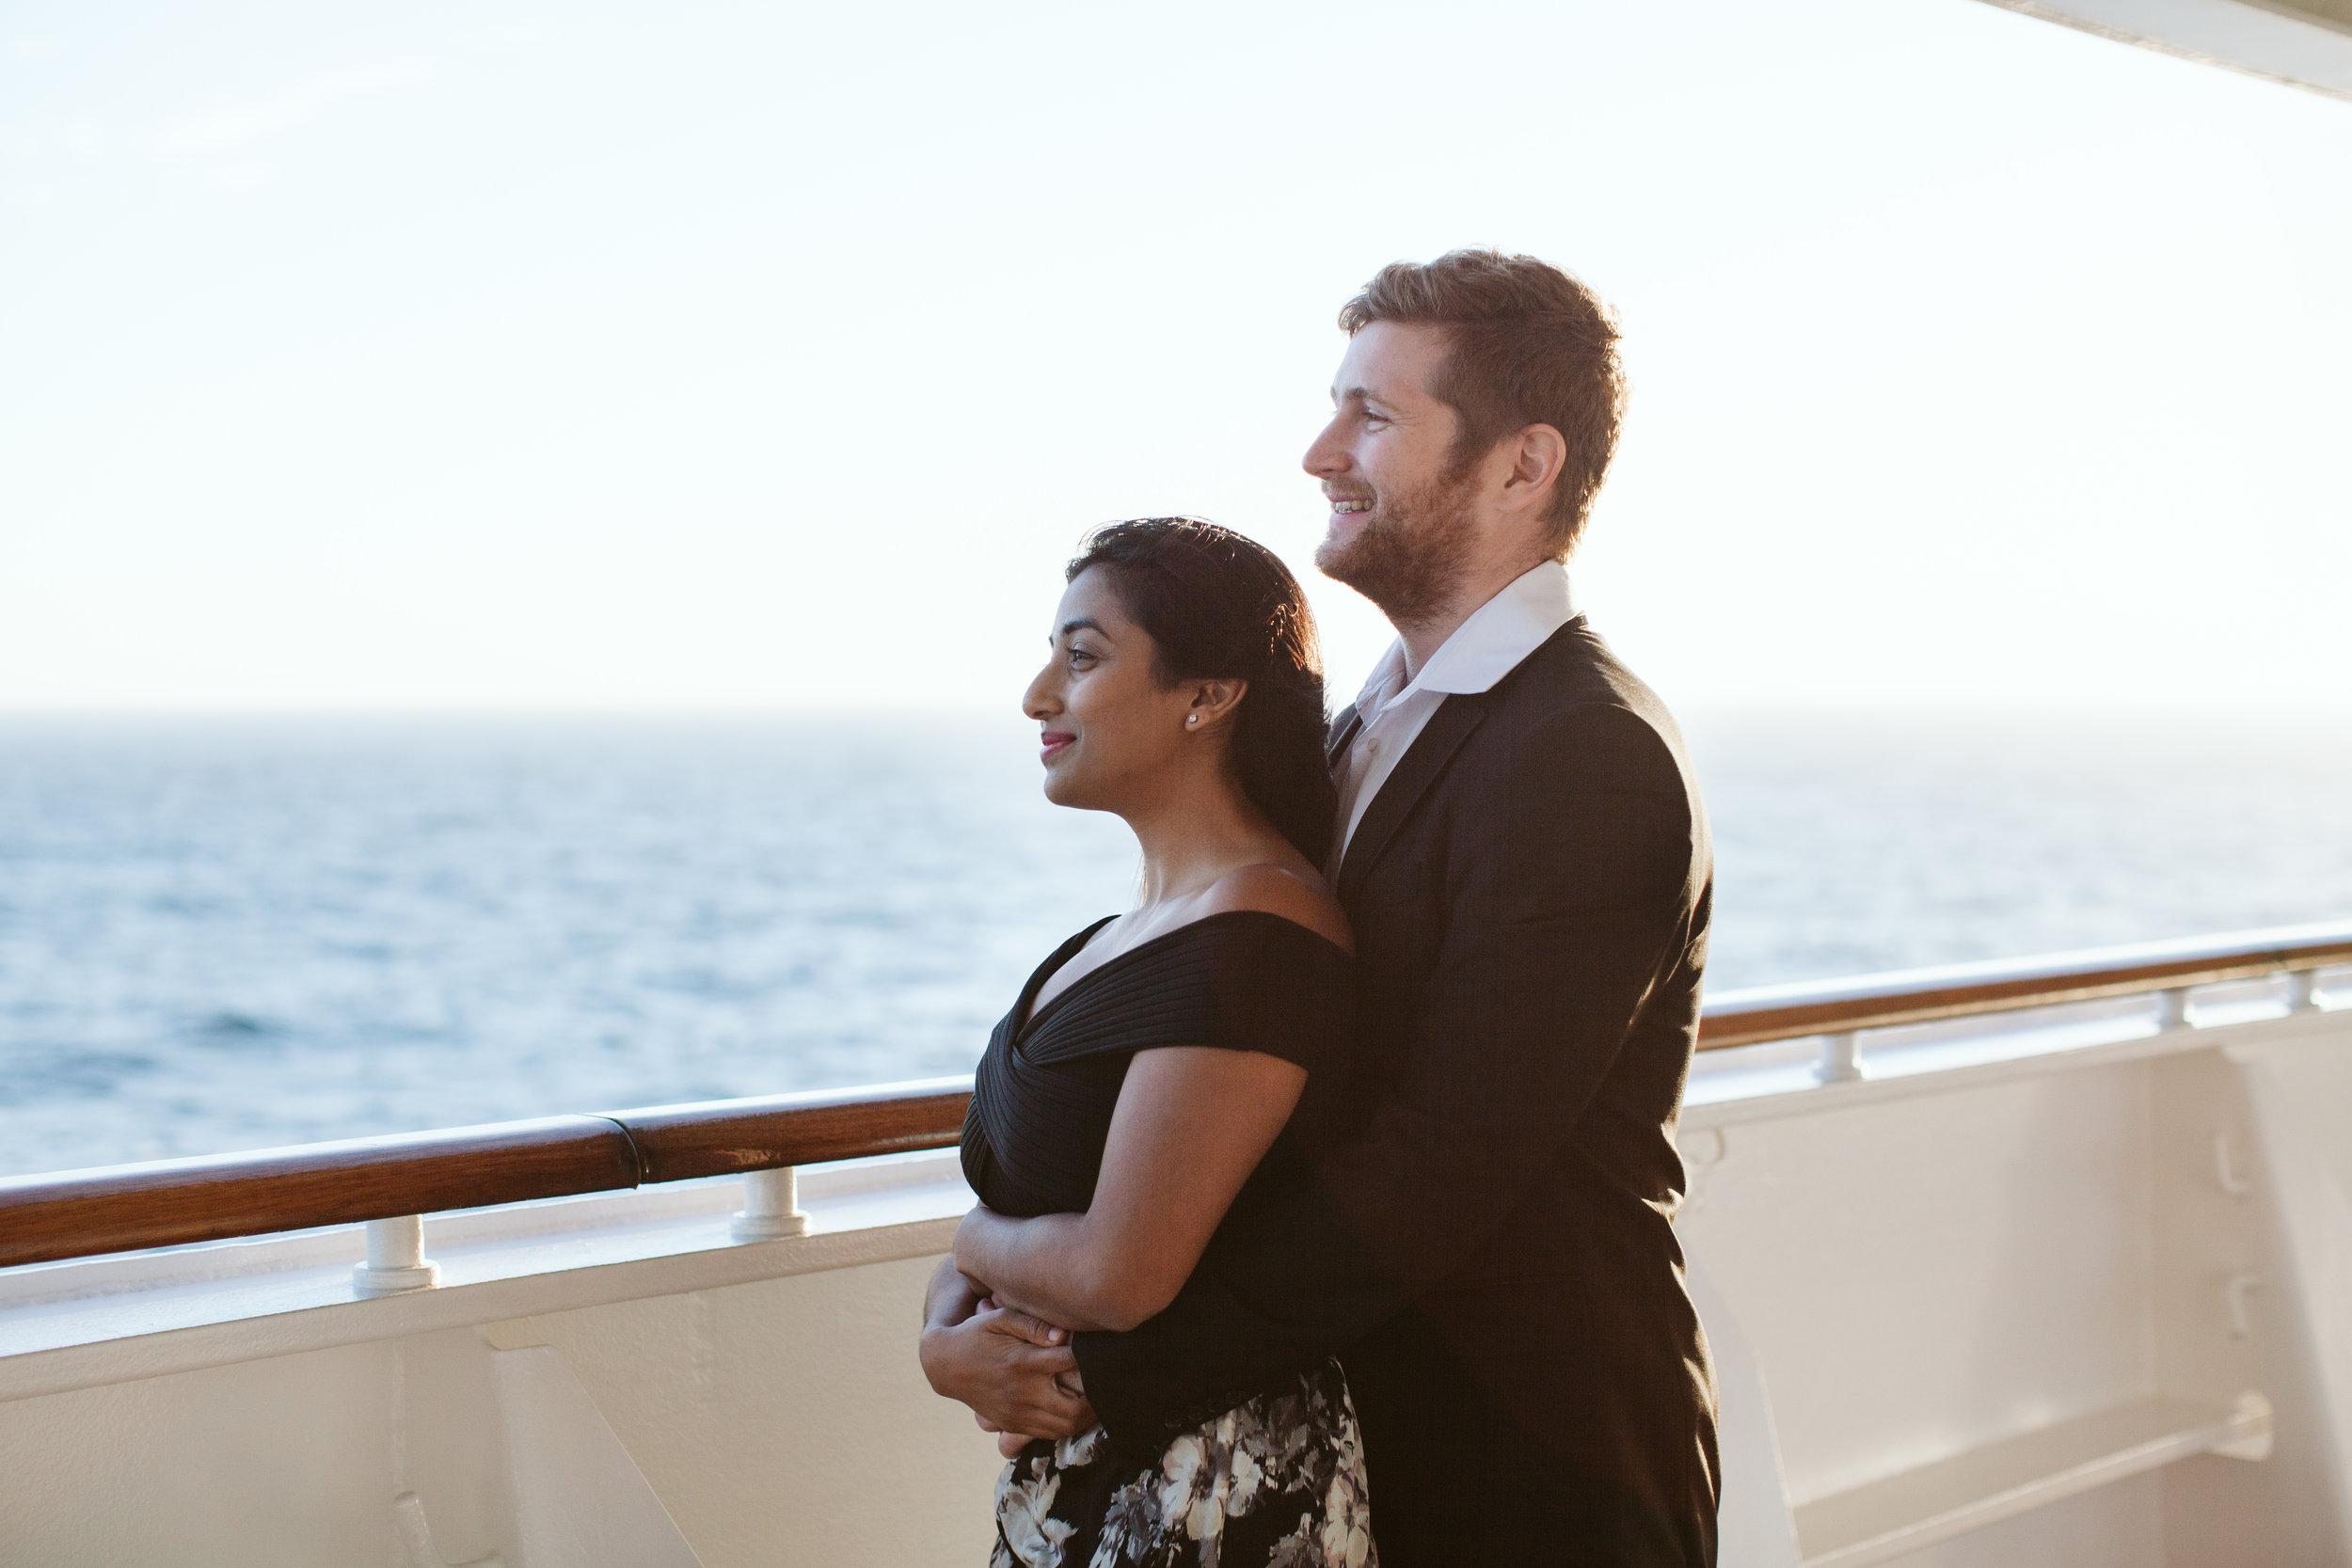 Engagement_Southern Oregon_Cruise_Alaska_Couple (13 of 15).jpg